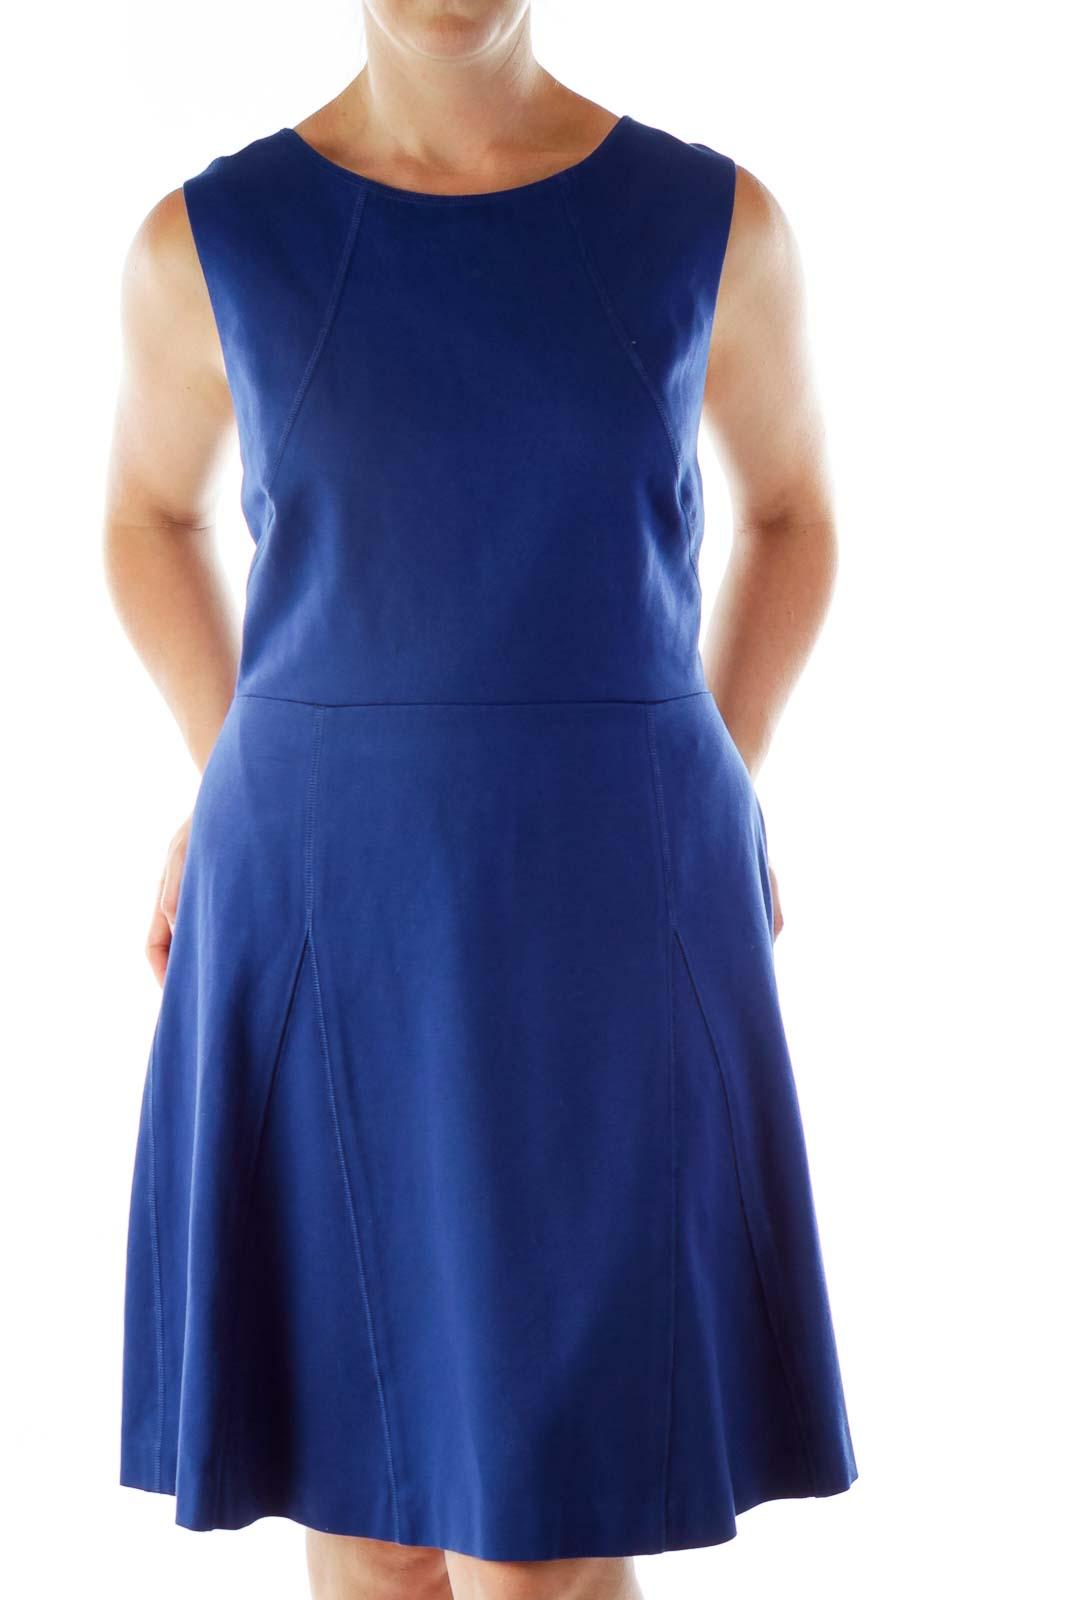 Royal Blue Open-Back Dress Front